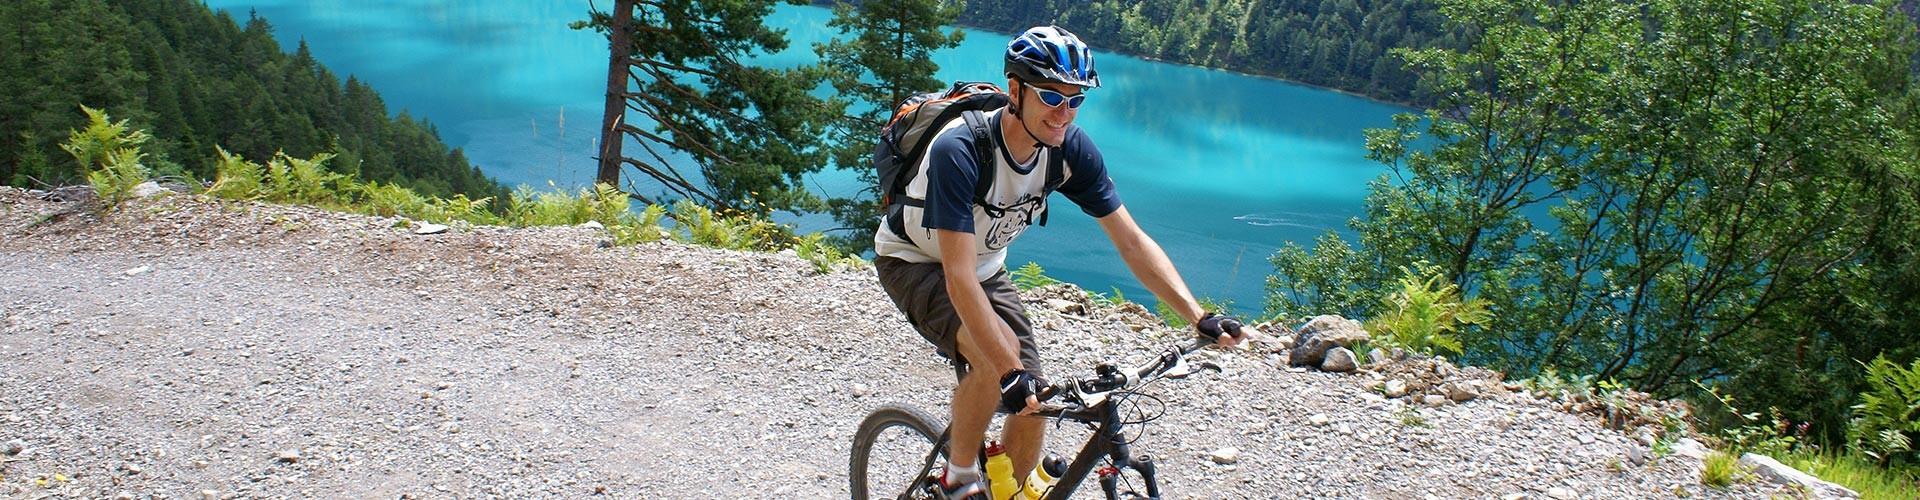 Mountainbike Urlaub in Berchtesgaden